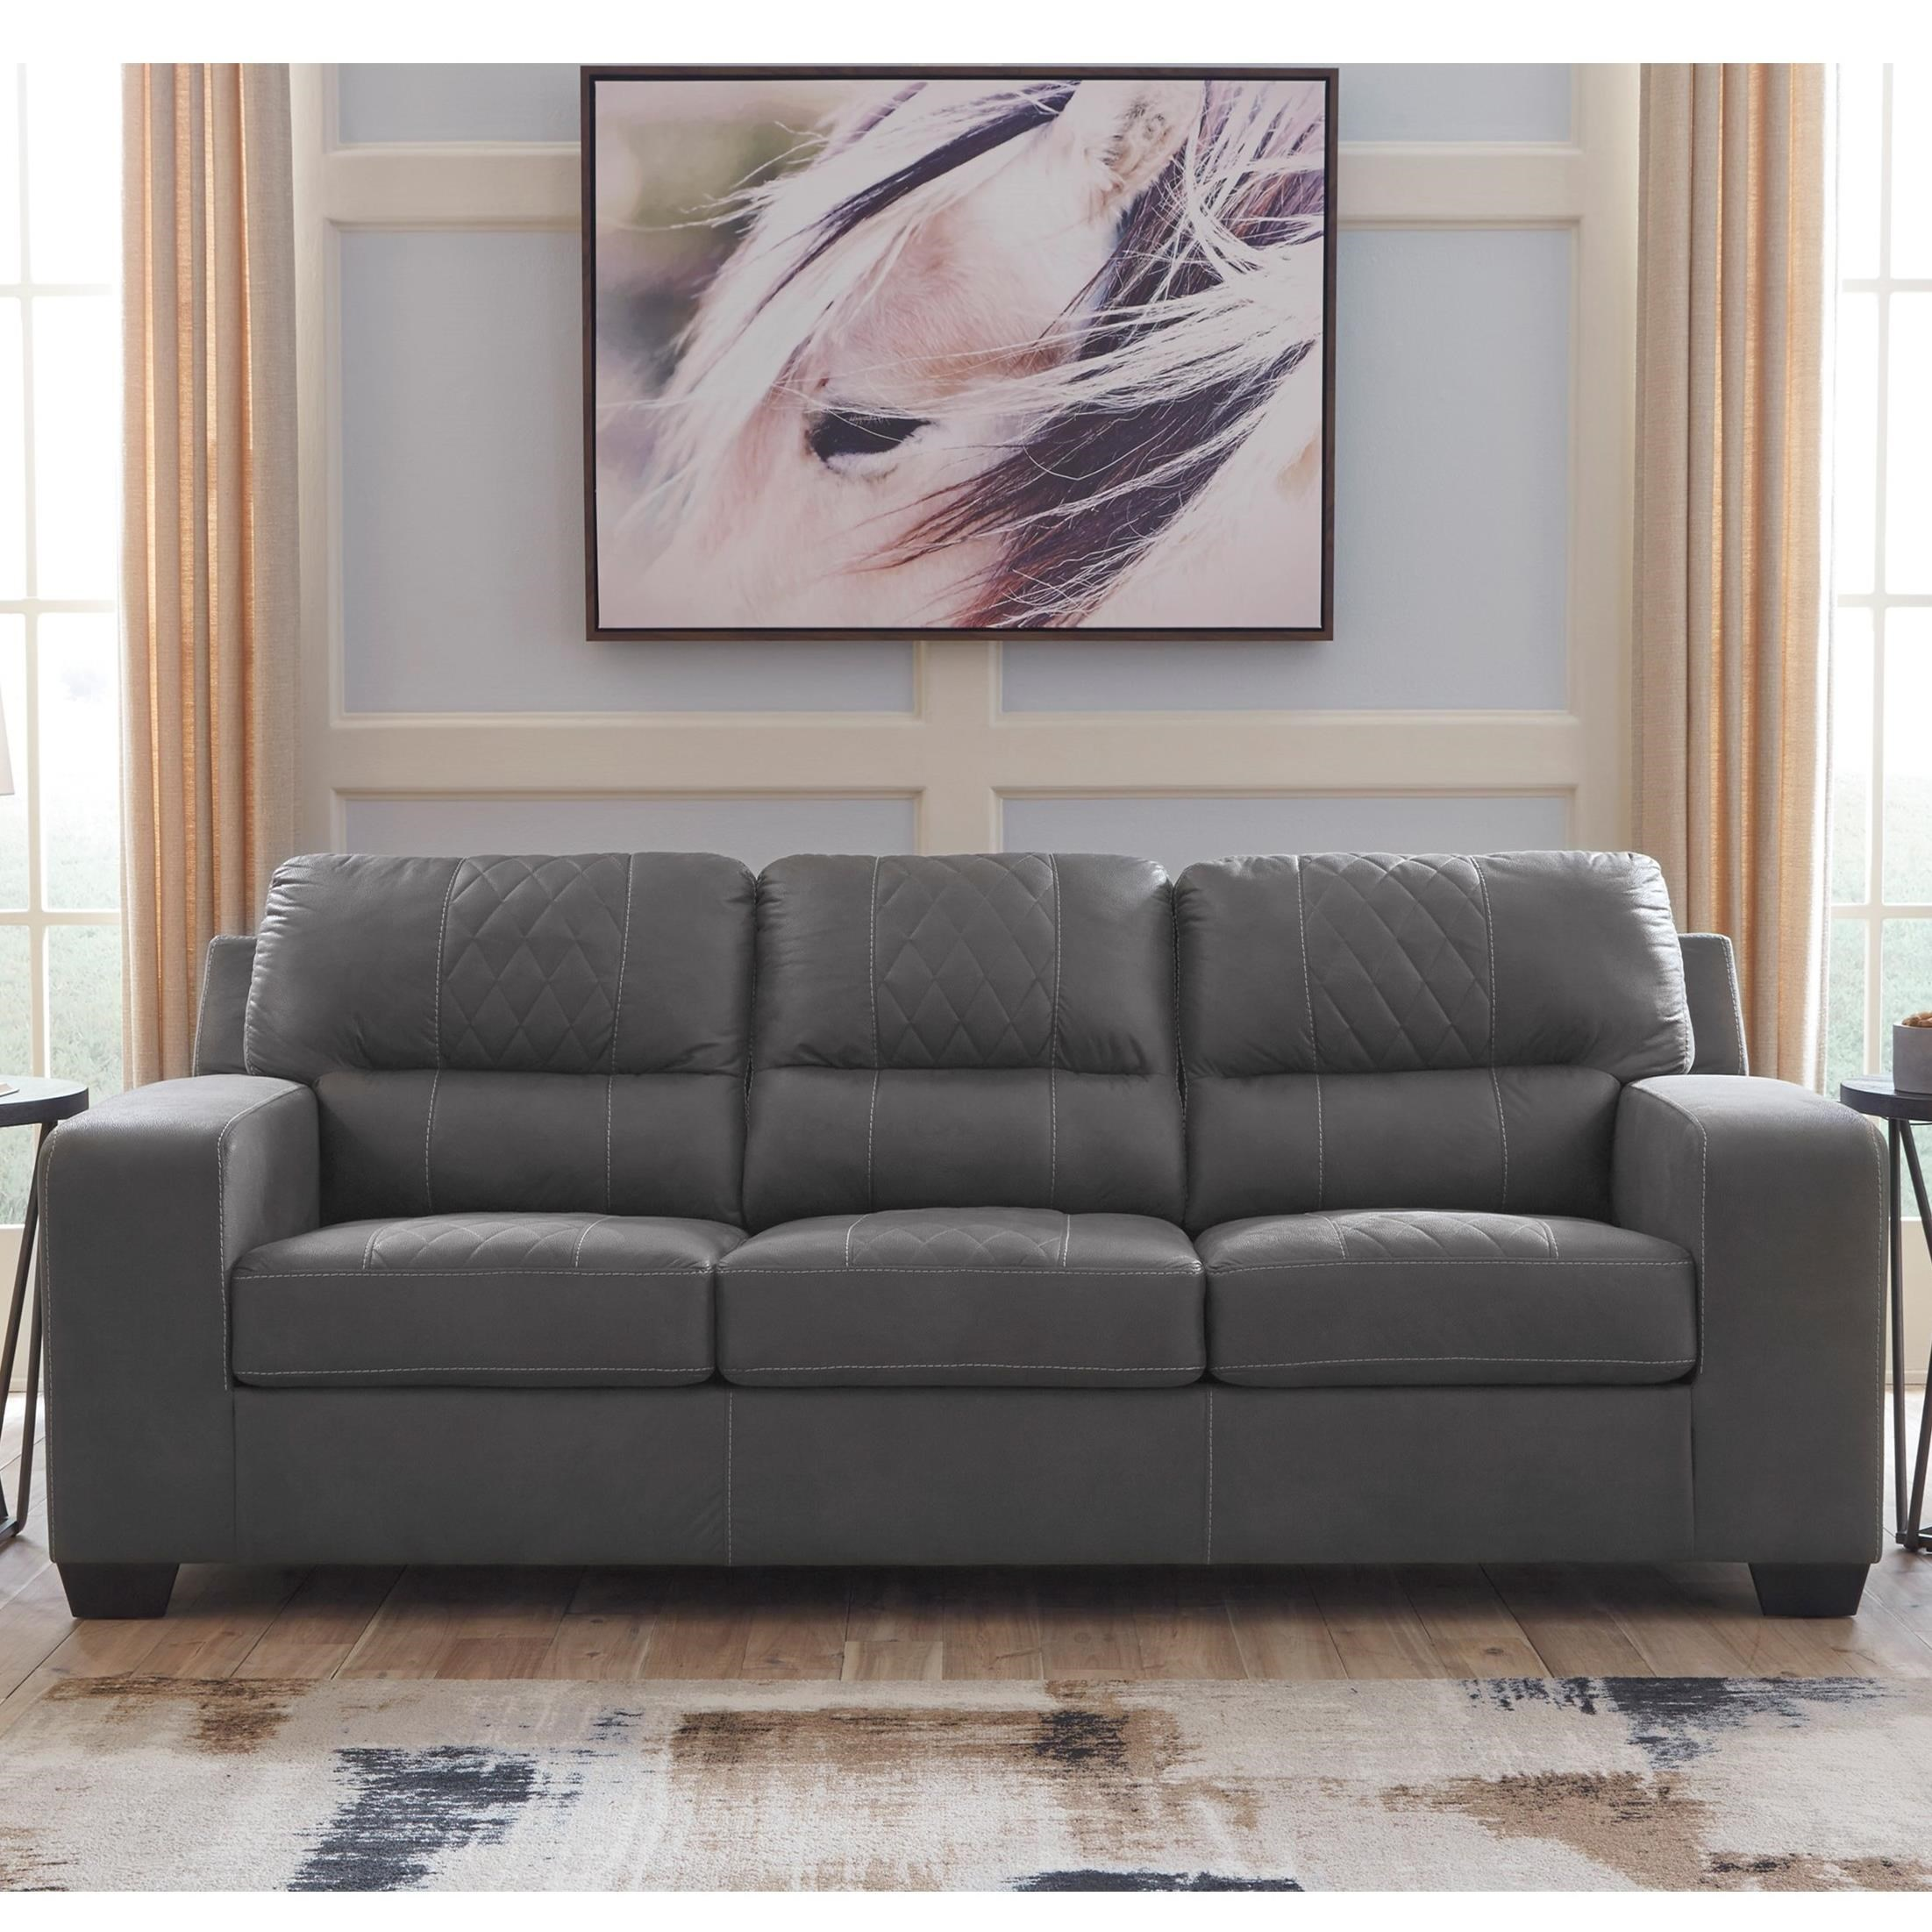 JB King Narzole 7440138 Contemporary Sofa EFO Furniture